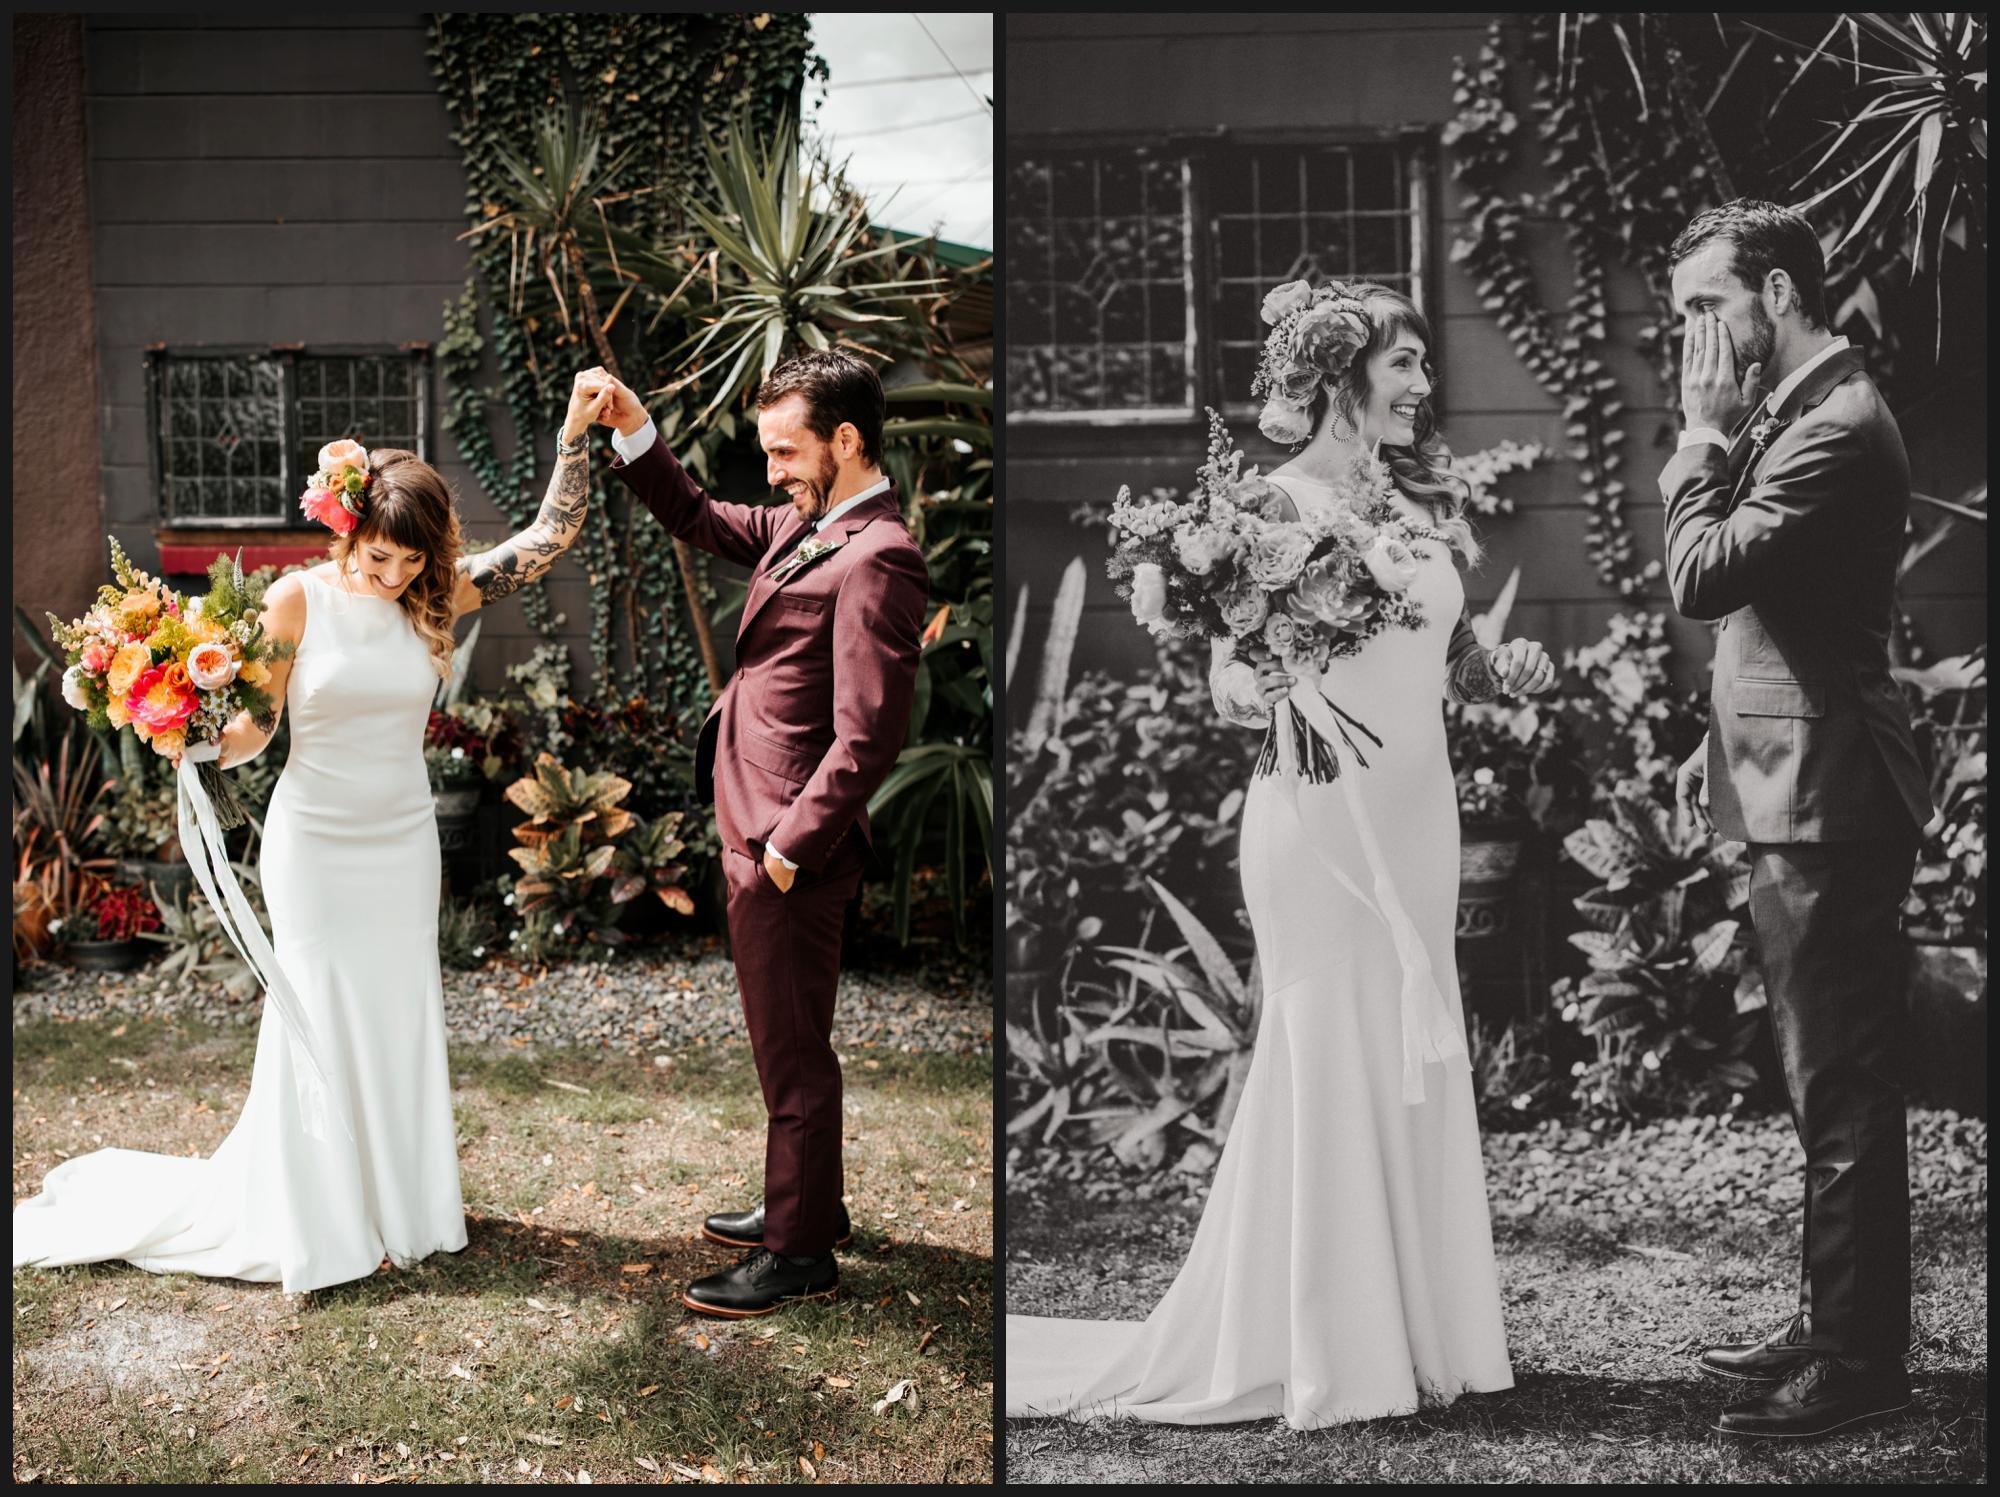 Orlando-Wedding-Photographer-destination-wedding-photographer-florida-wedding-photographer-bohemian-wedding-photographer_1943.jpg